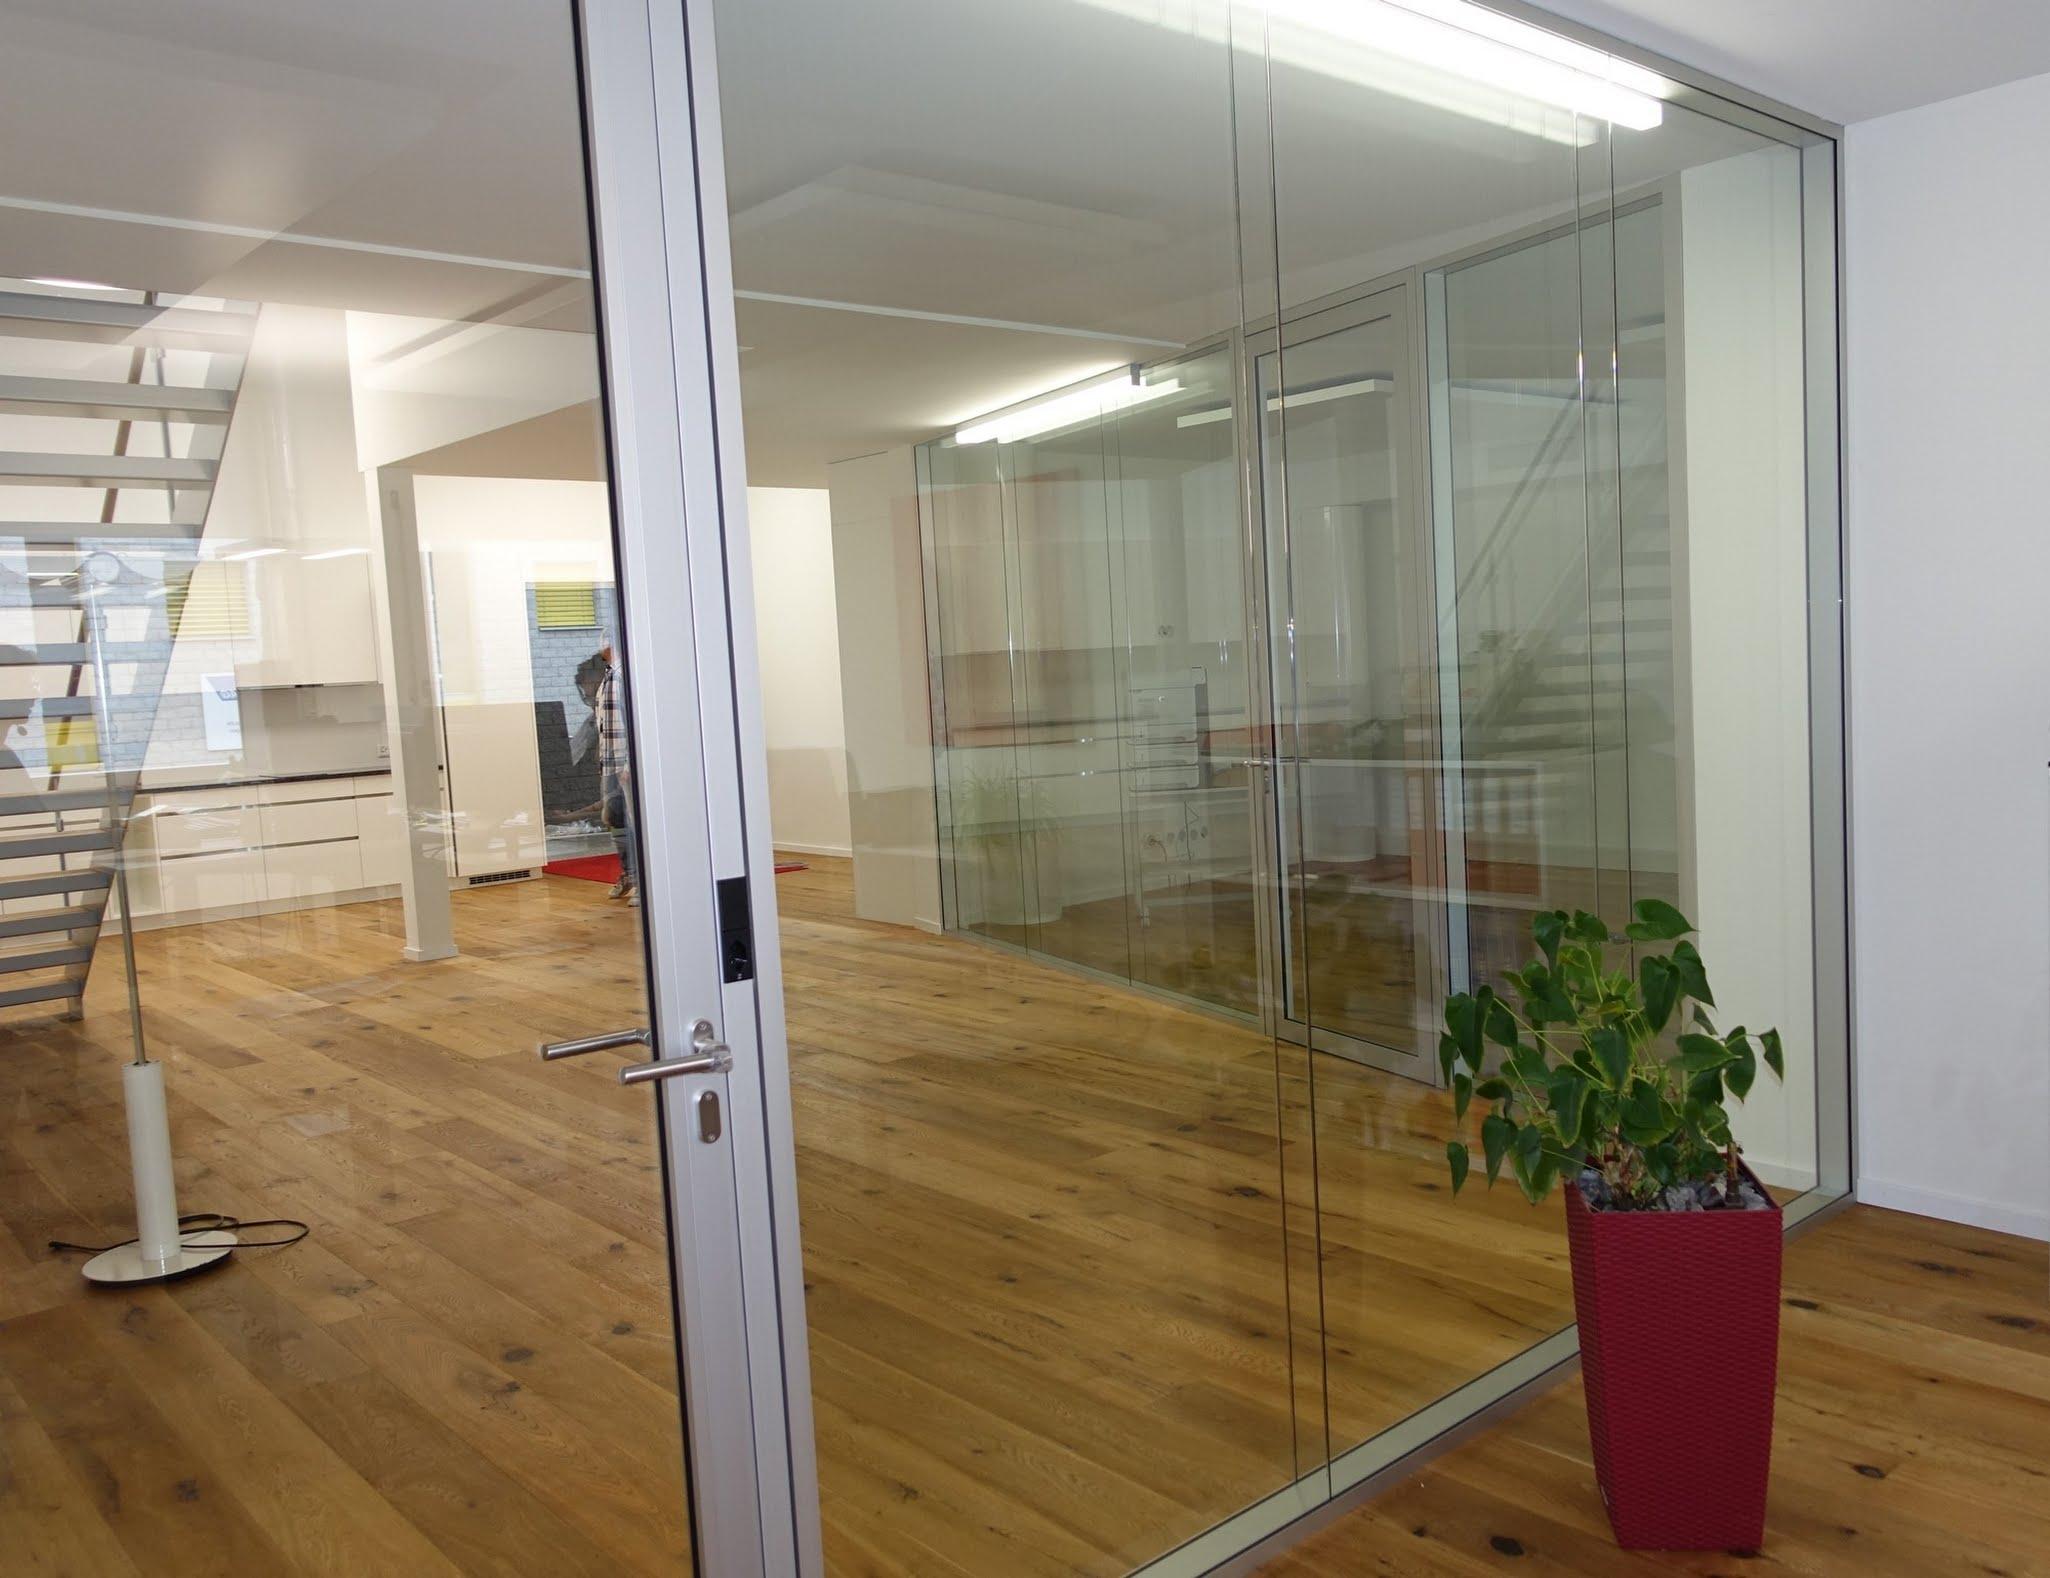 NovaPlain - Doppelverglasung,Durrer Technik AG,Deckensystem-Wandsysteme,Trennwände Büro,Ganzglaswände,Bürotrennwand,Akustikdecken,Schallschutzdecken,Trennwände,Glaswände,Faltwände,Raumgestaltung,Trennwand Systeme